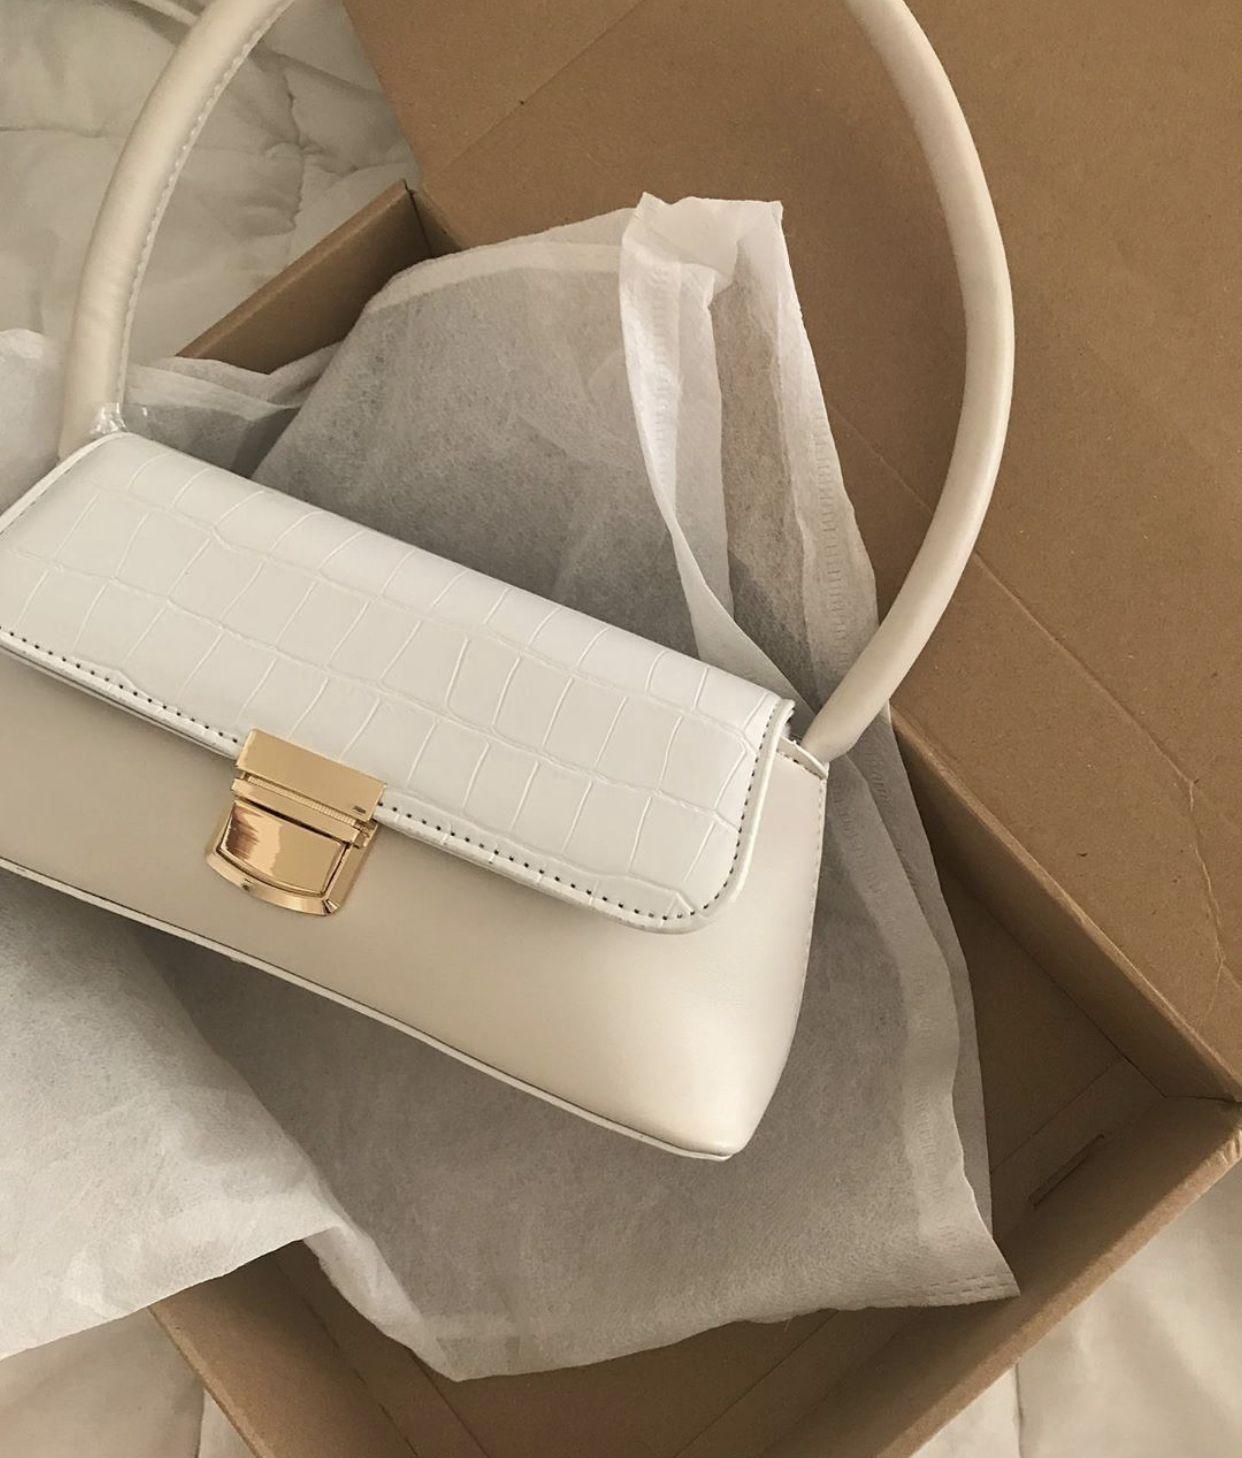 Pin by Gigi on b a g s | Fashion bags, Pretty bags, Stylish bag